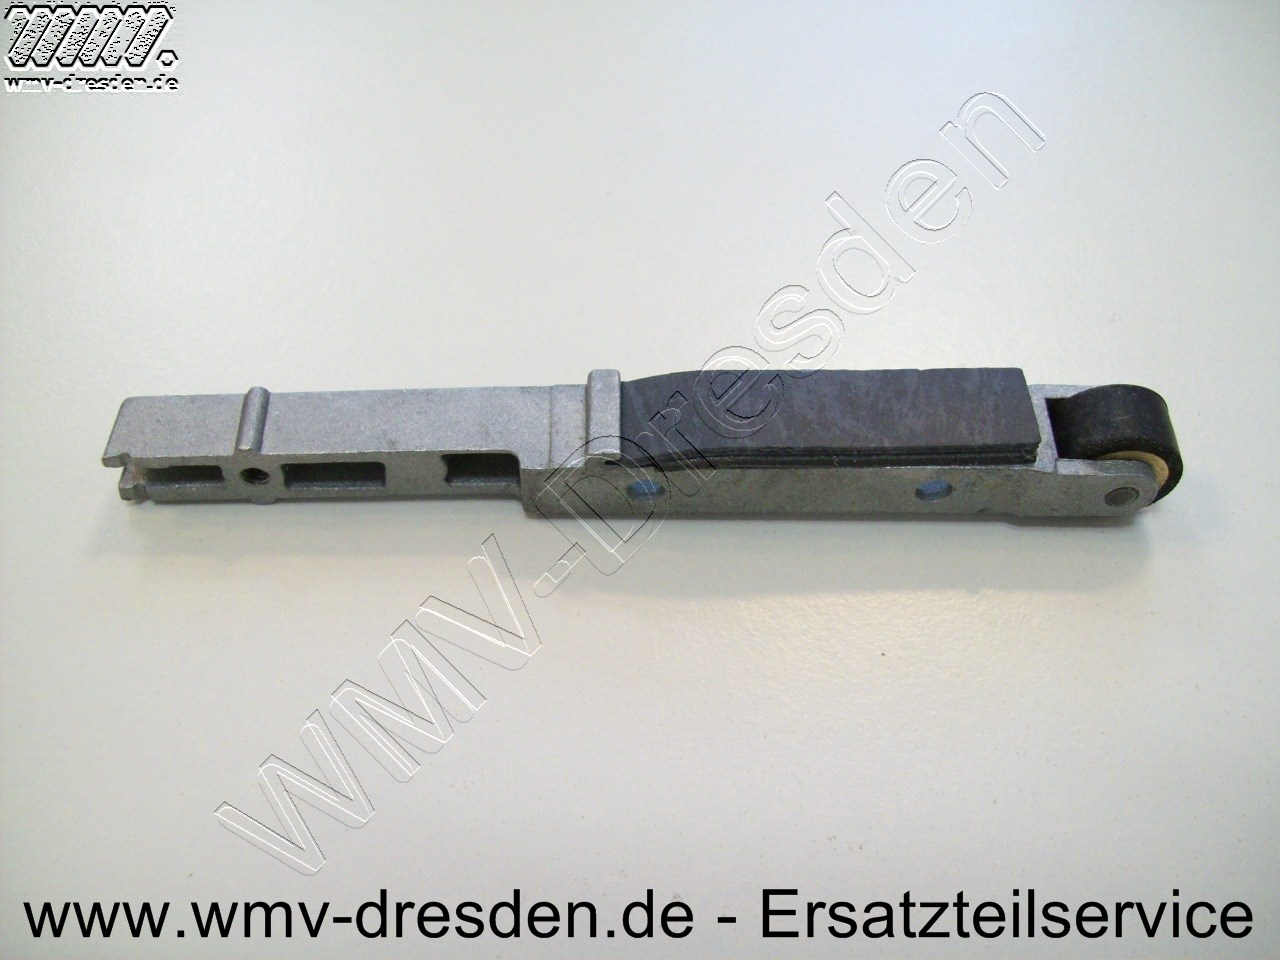 ARM 13 CM LANG >>> GUMMIPLATTE 090520643 IST BEREITS ENTHALTEN <<<